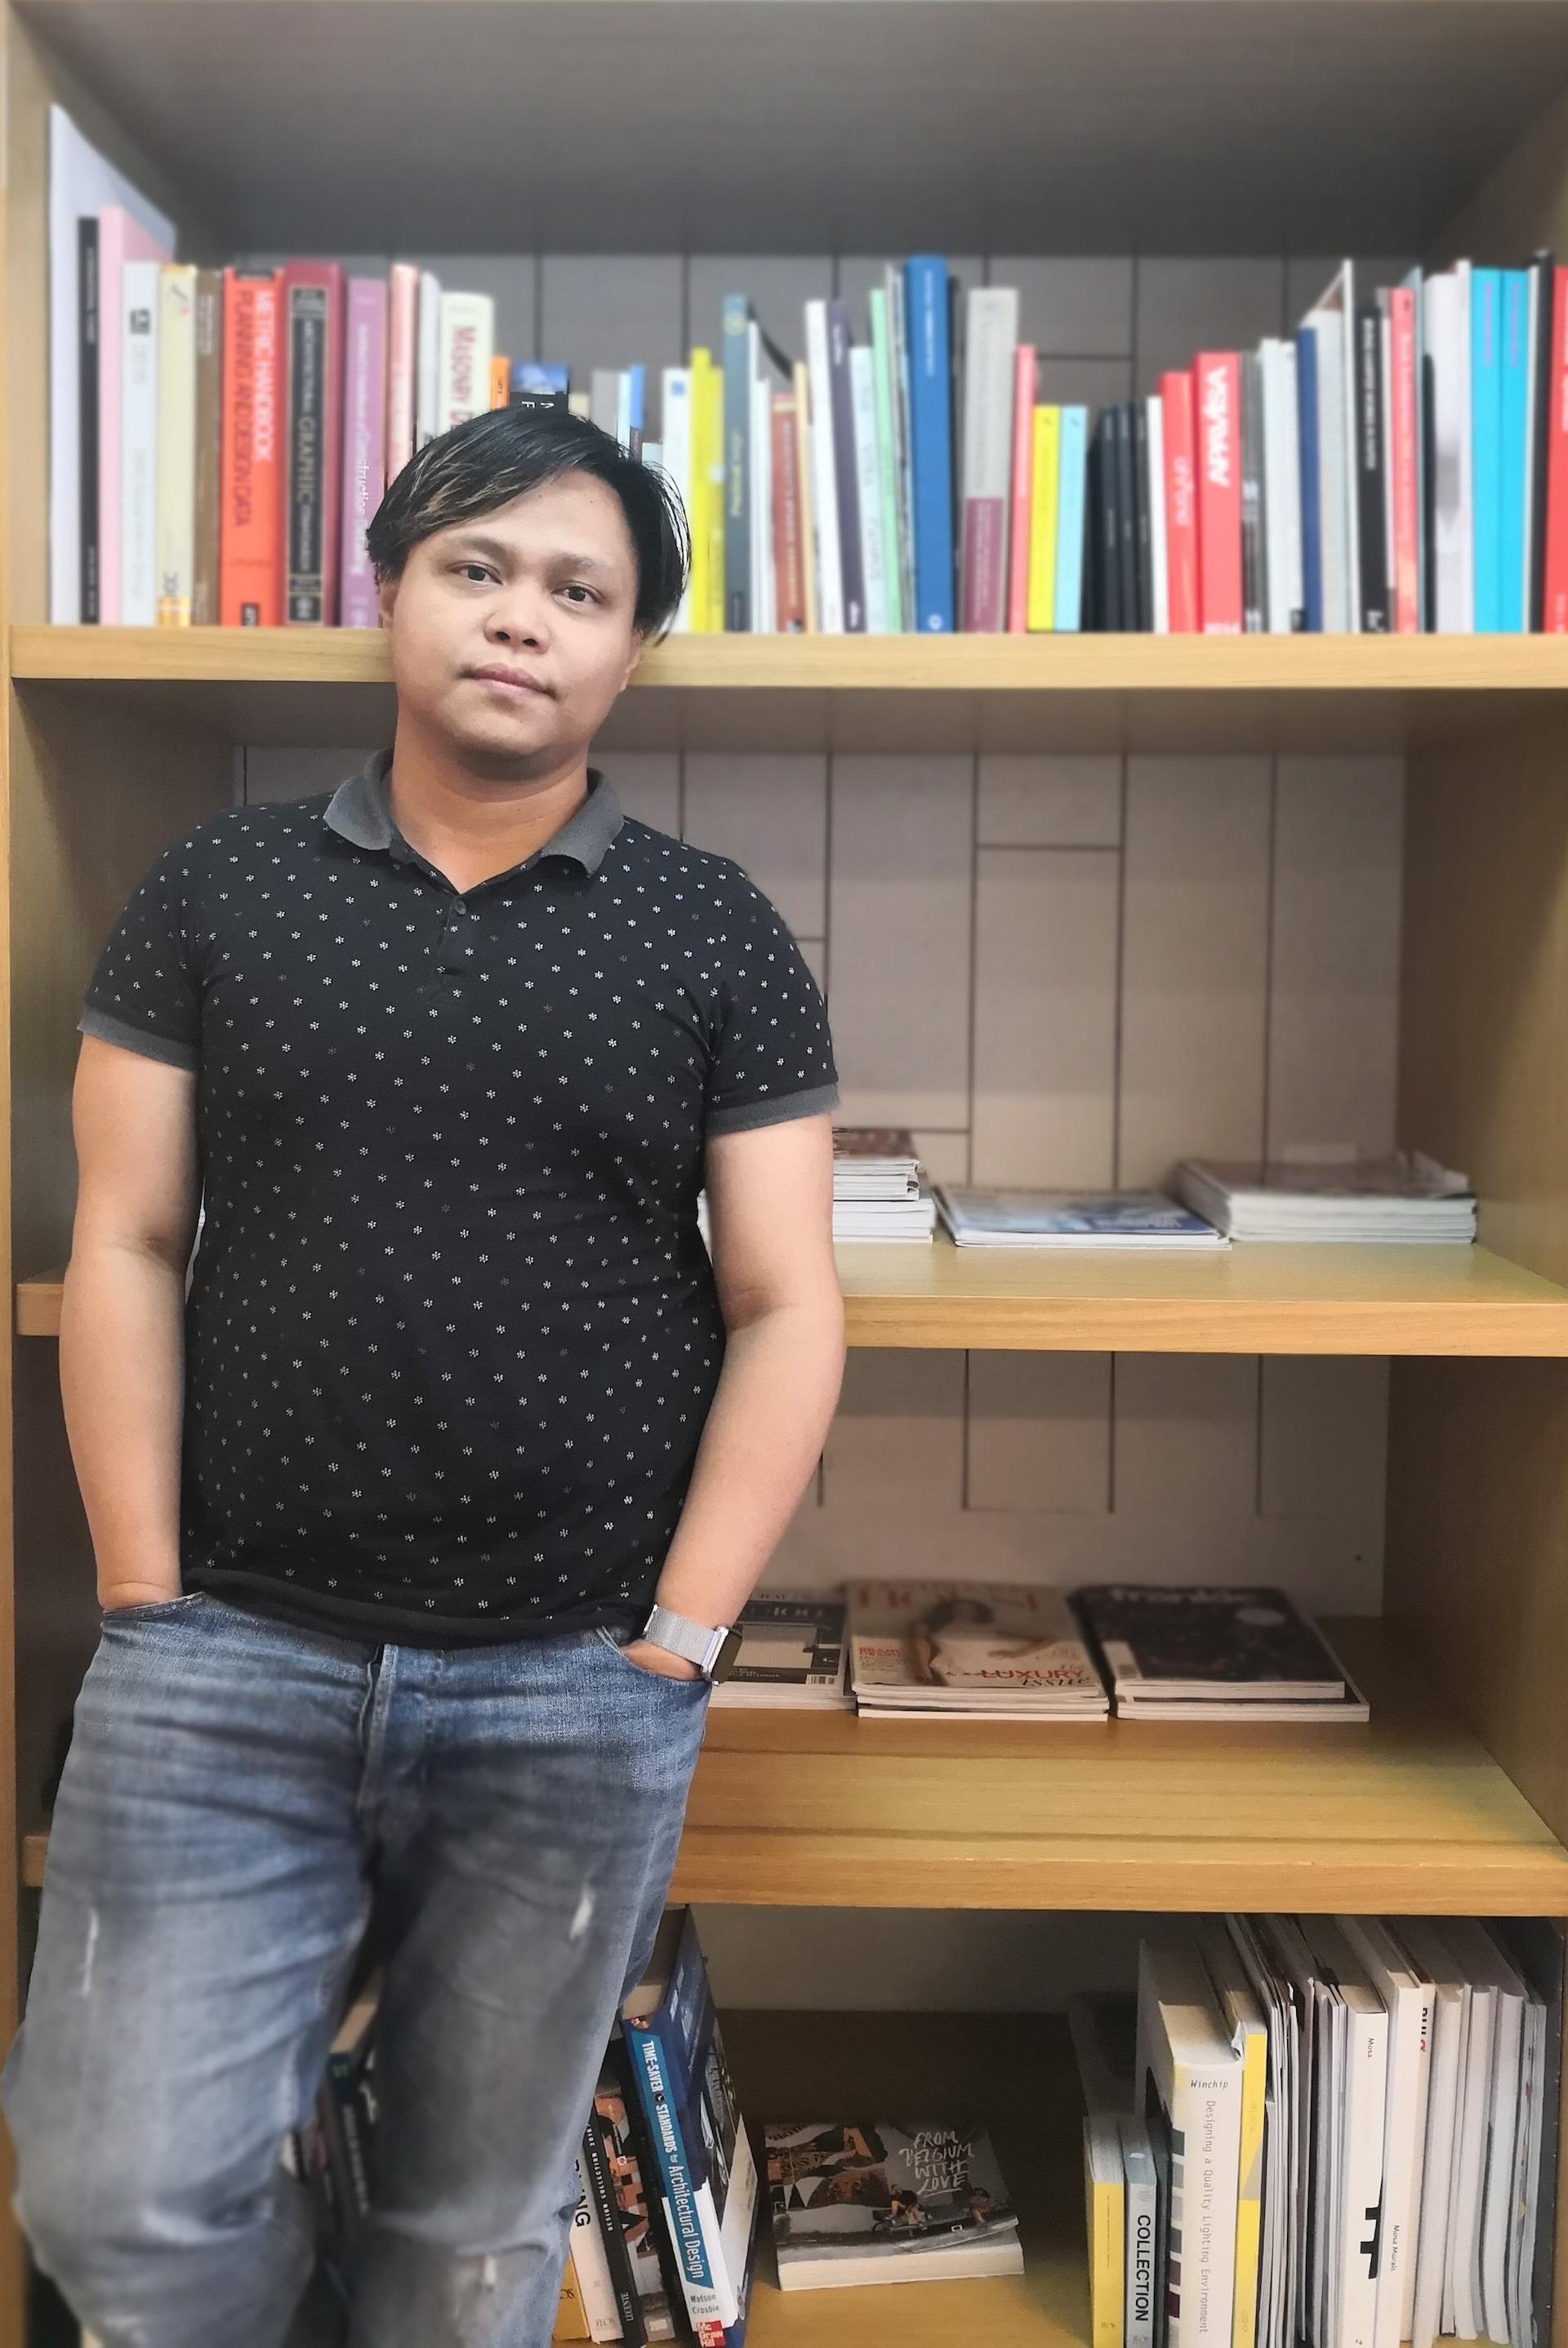 Robert Maramag AAID Behind the scenes shortlist 2018